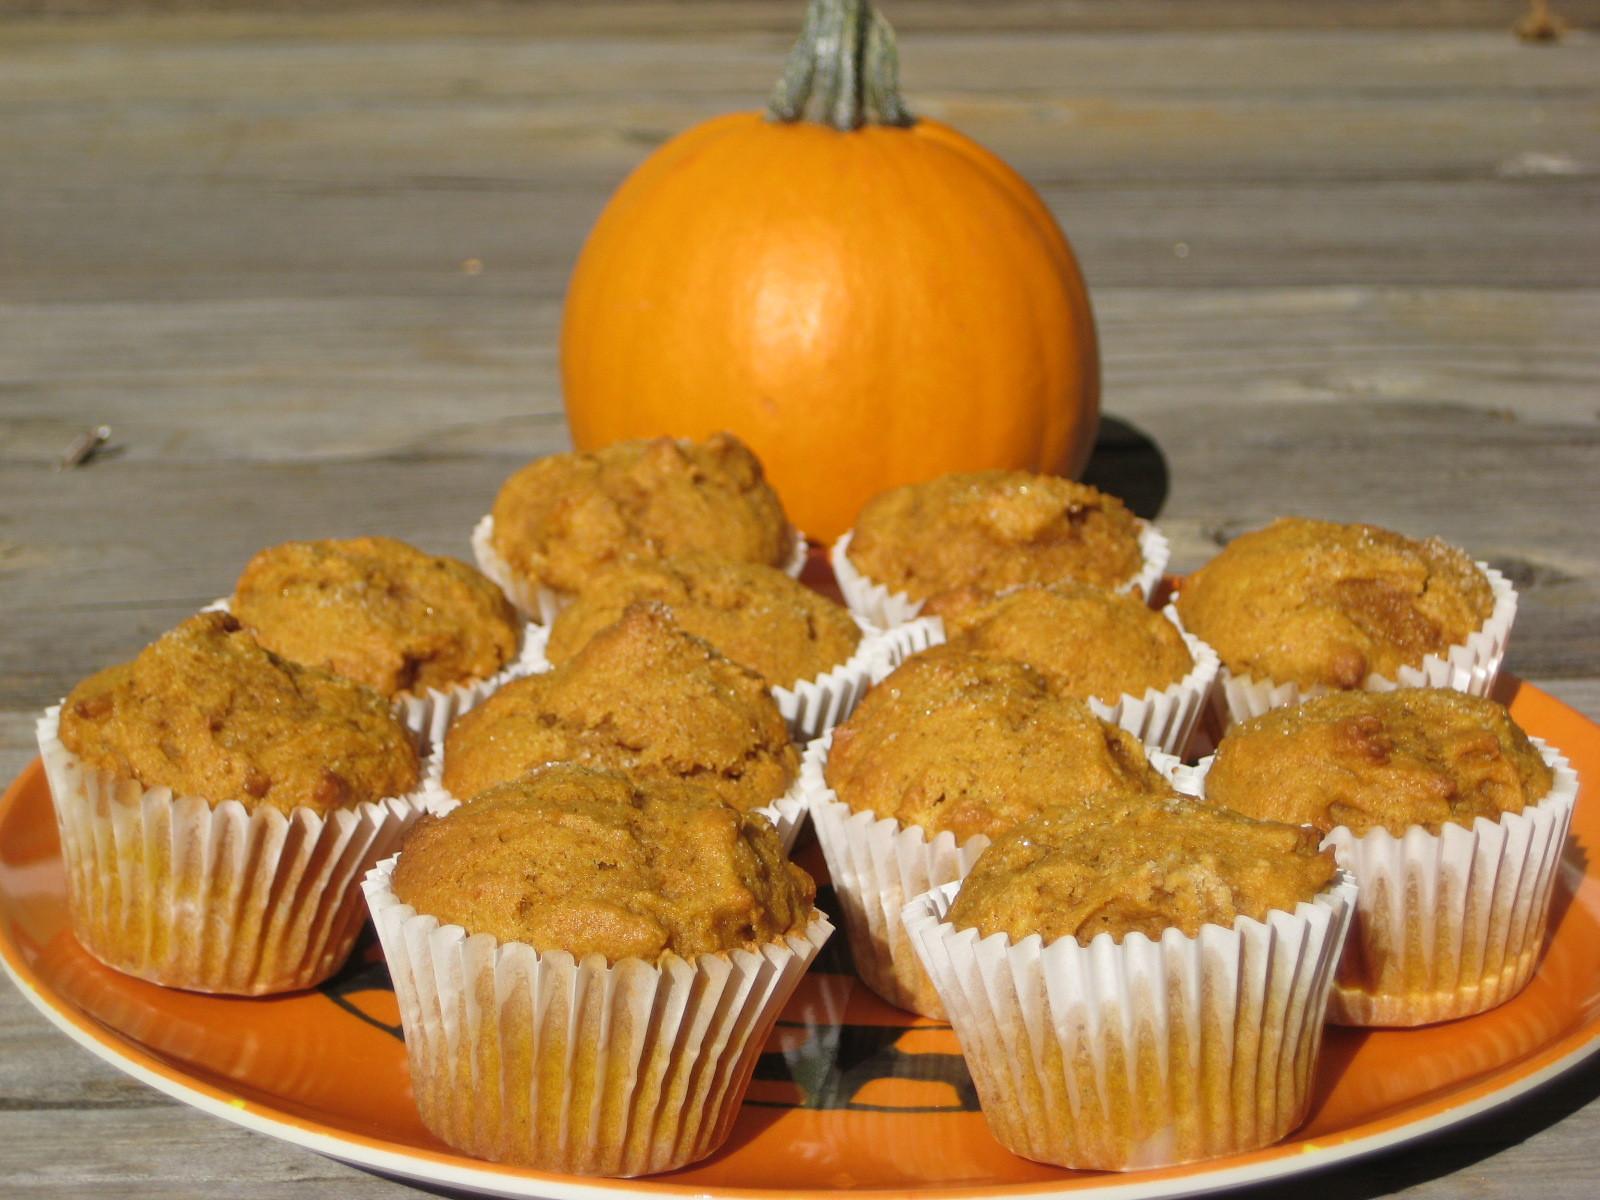 Healthy Pumpkin Snacks  Healthy School Party Snack The Best Pumpkin Mini Muffins